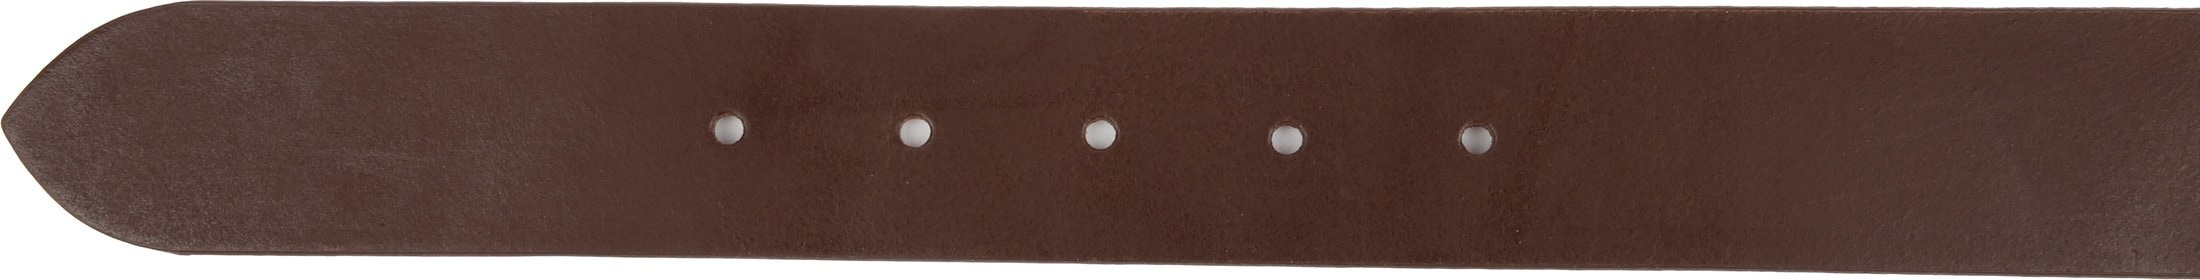 Levi's  Lev 8 Leather Belt Brown photo 2